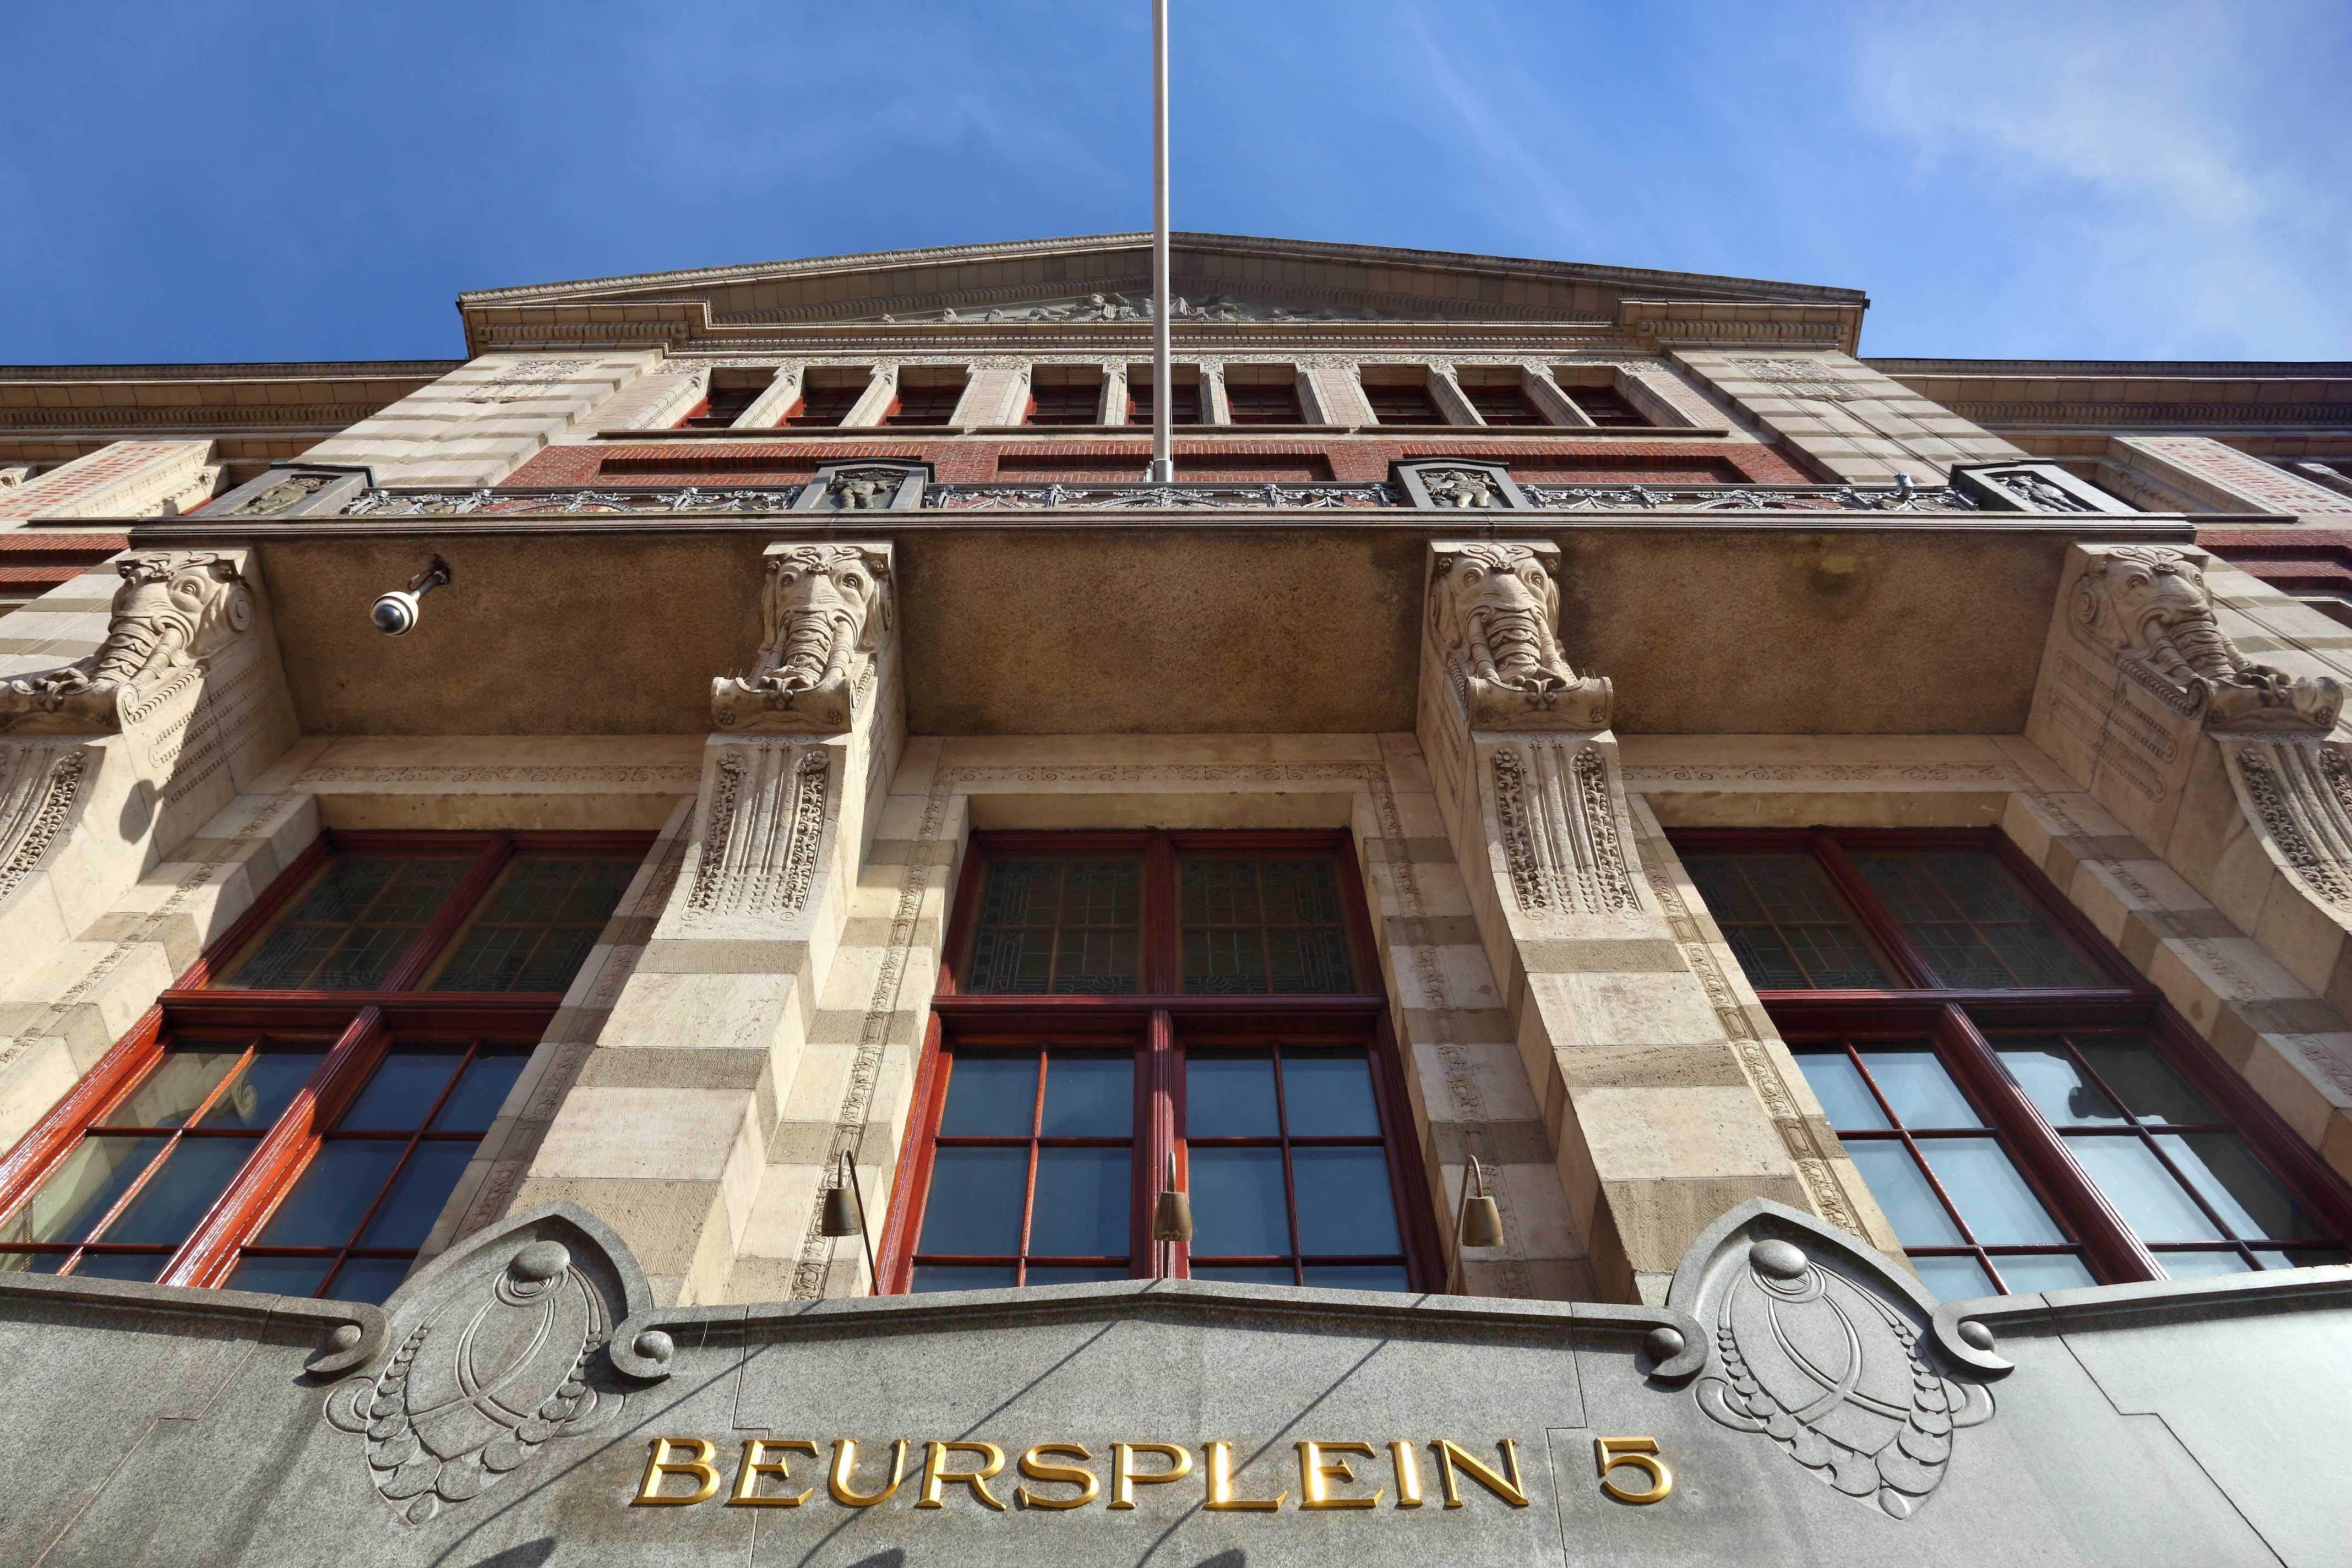 Beursplein 5 in Amsterdam